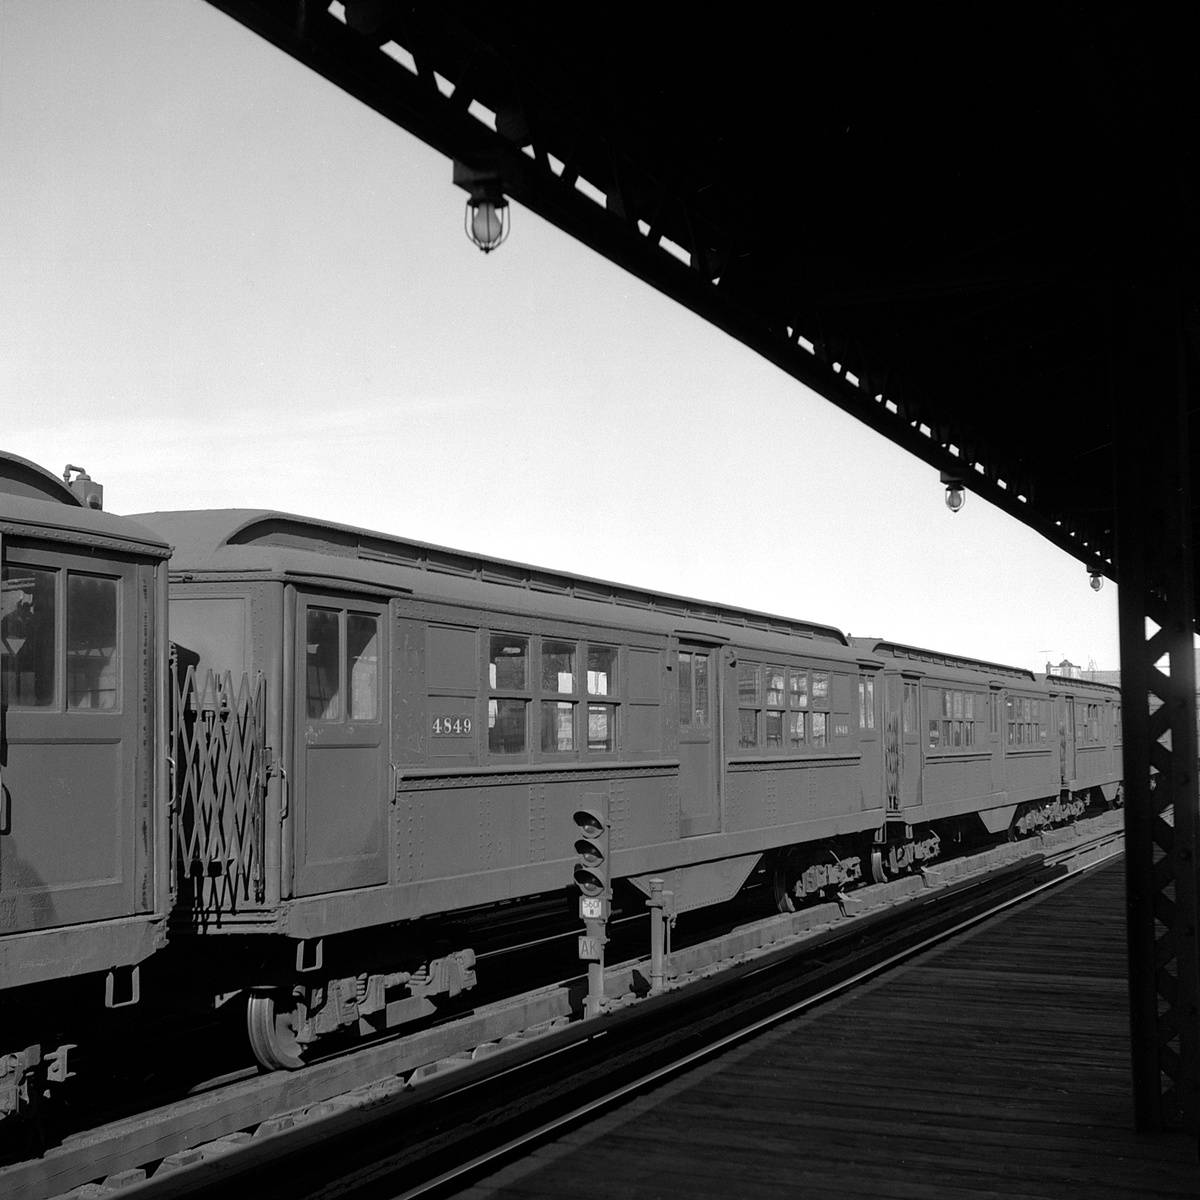 (392k, 1200x1200)<br><b>Country:</b> United States<br><b>City:</b> New York<br><b>System:</b> New York City Transit<br><b>Line:</b> IRT White Plains Road Line<br><b>Location:</b> 225th Street <br><b>Route:</b> Layup<br><b>Car:</b> Low-V 4849 <br><b>Collection of:</b> David Pirmann<br><b>Date:</b> 11/14/1962<br><b>Viewed (this week/total):</b> 0 / 53